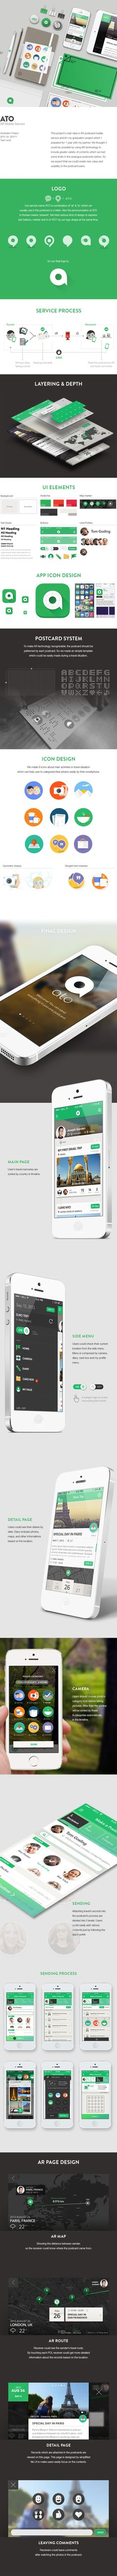 ato on App Design Served Web Design, App Ui Design, Identity Design, Logo Design, Visual Identity, Brand Identity, Creative Design, Graphic Design, Gui Interface